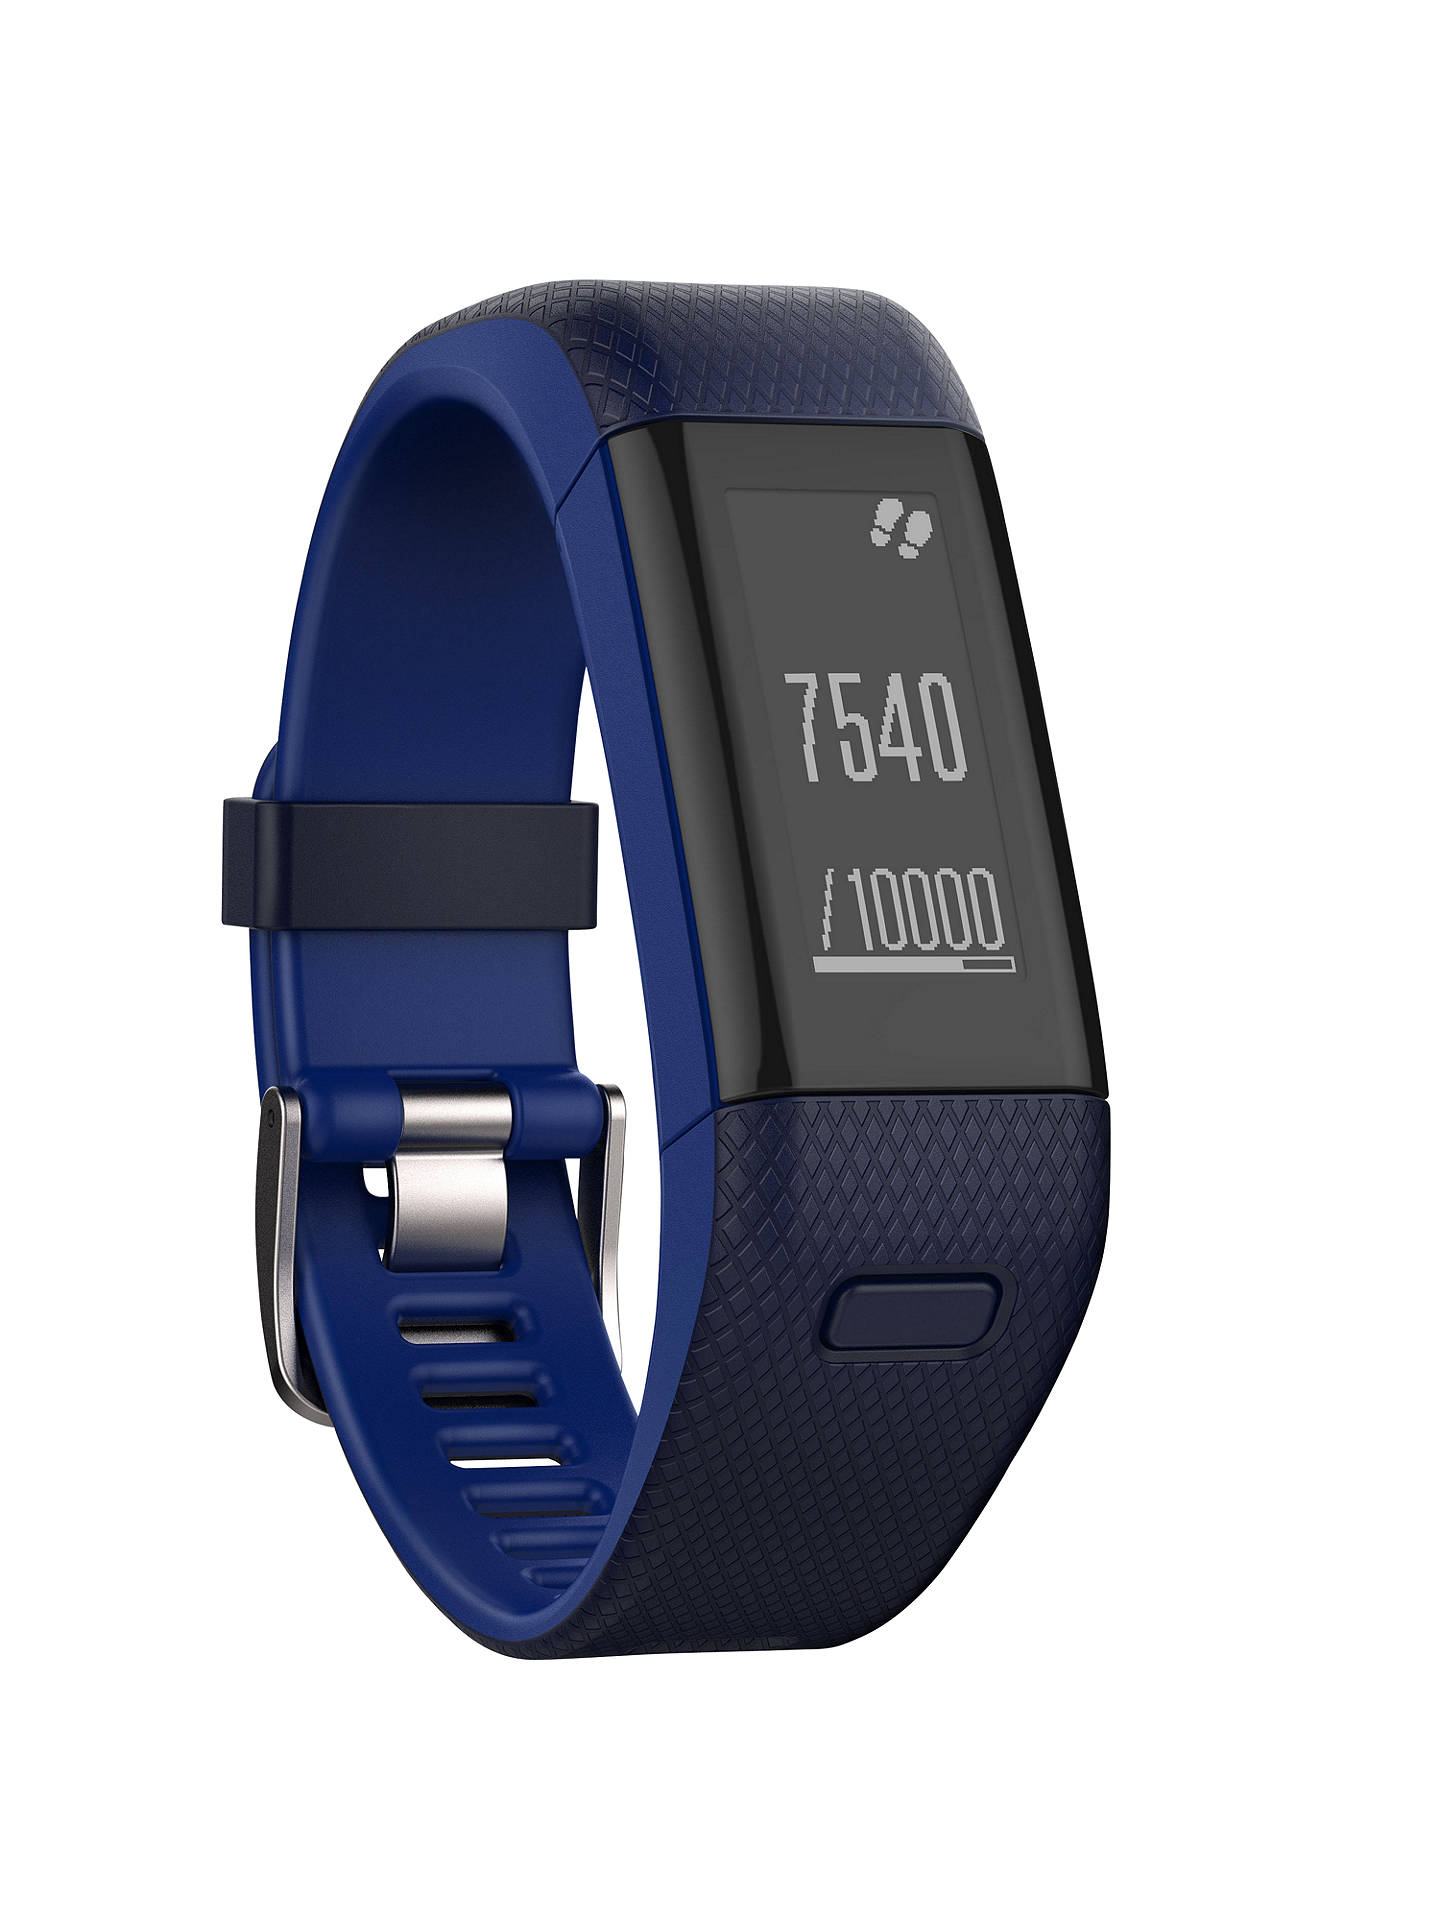 Garmin Vivosmart Hr Sports Gps Activity Tracker With Wrist Heart Rate Monitor Regular At John Lewis Partners